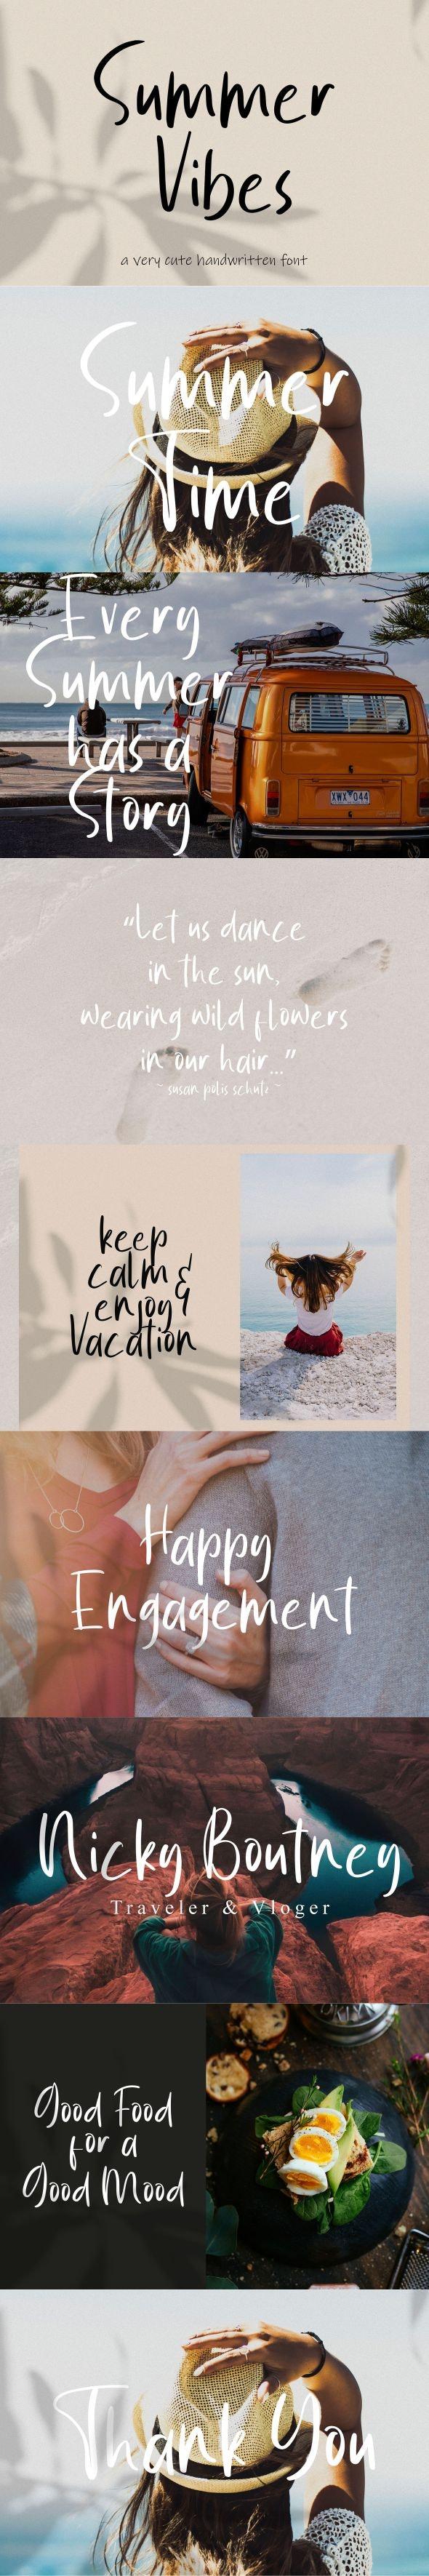 Summer Vibes Font - Handwriting Fonts